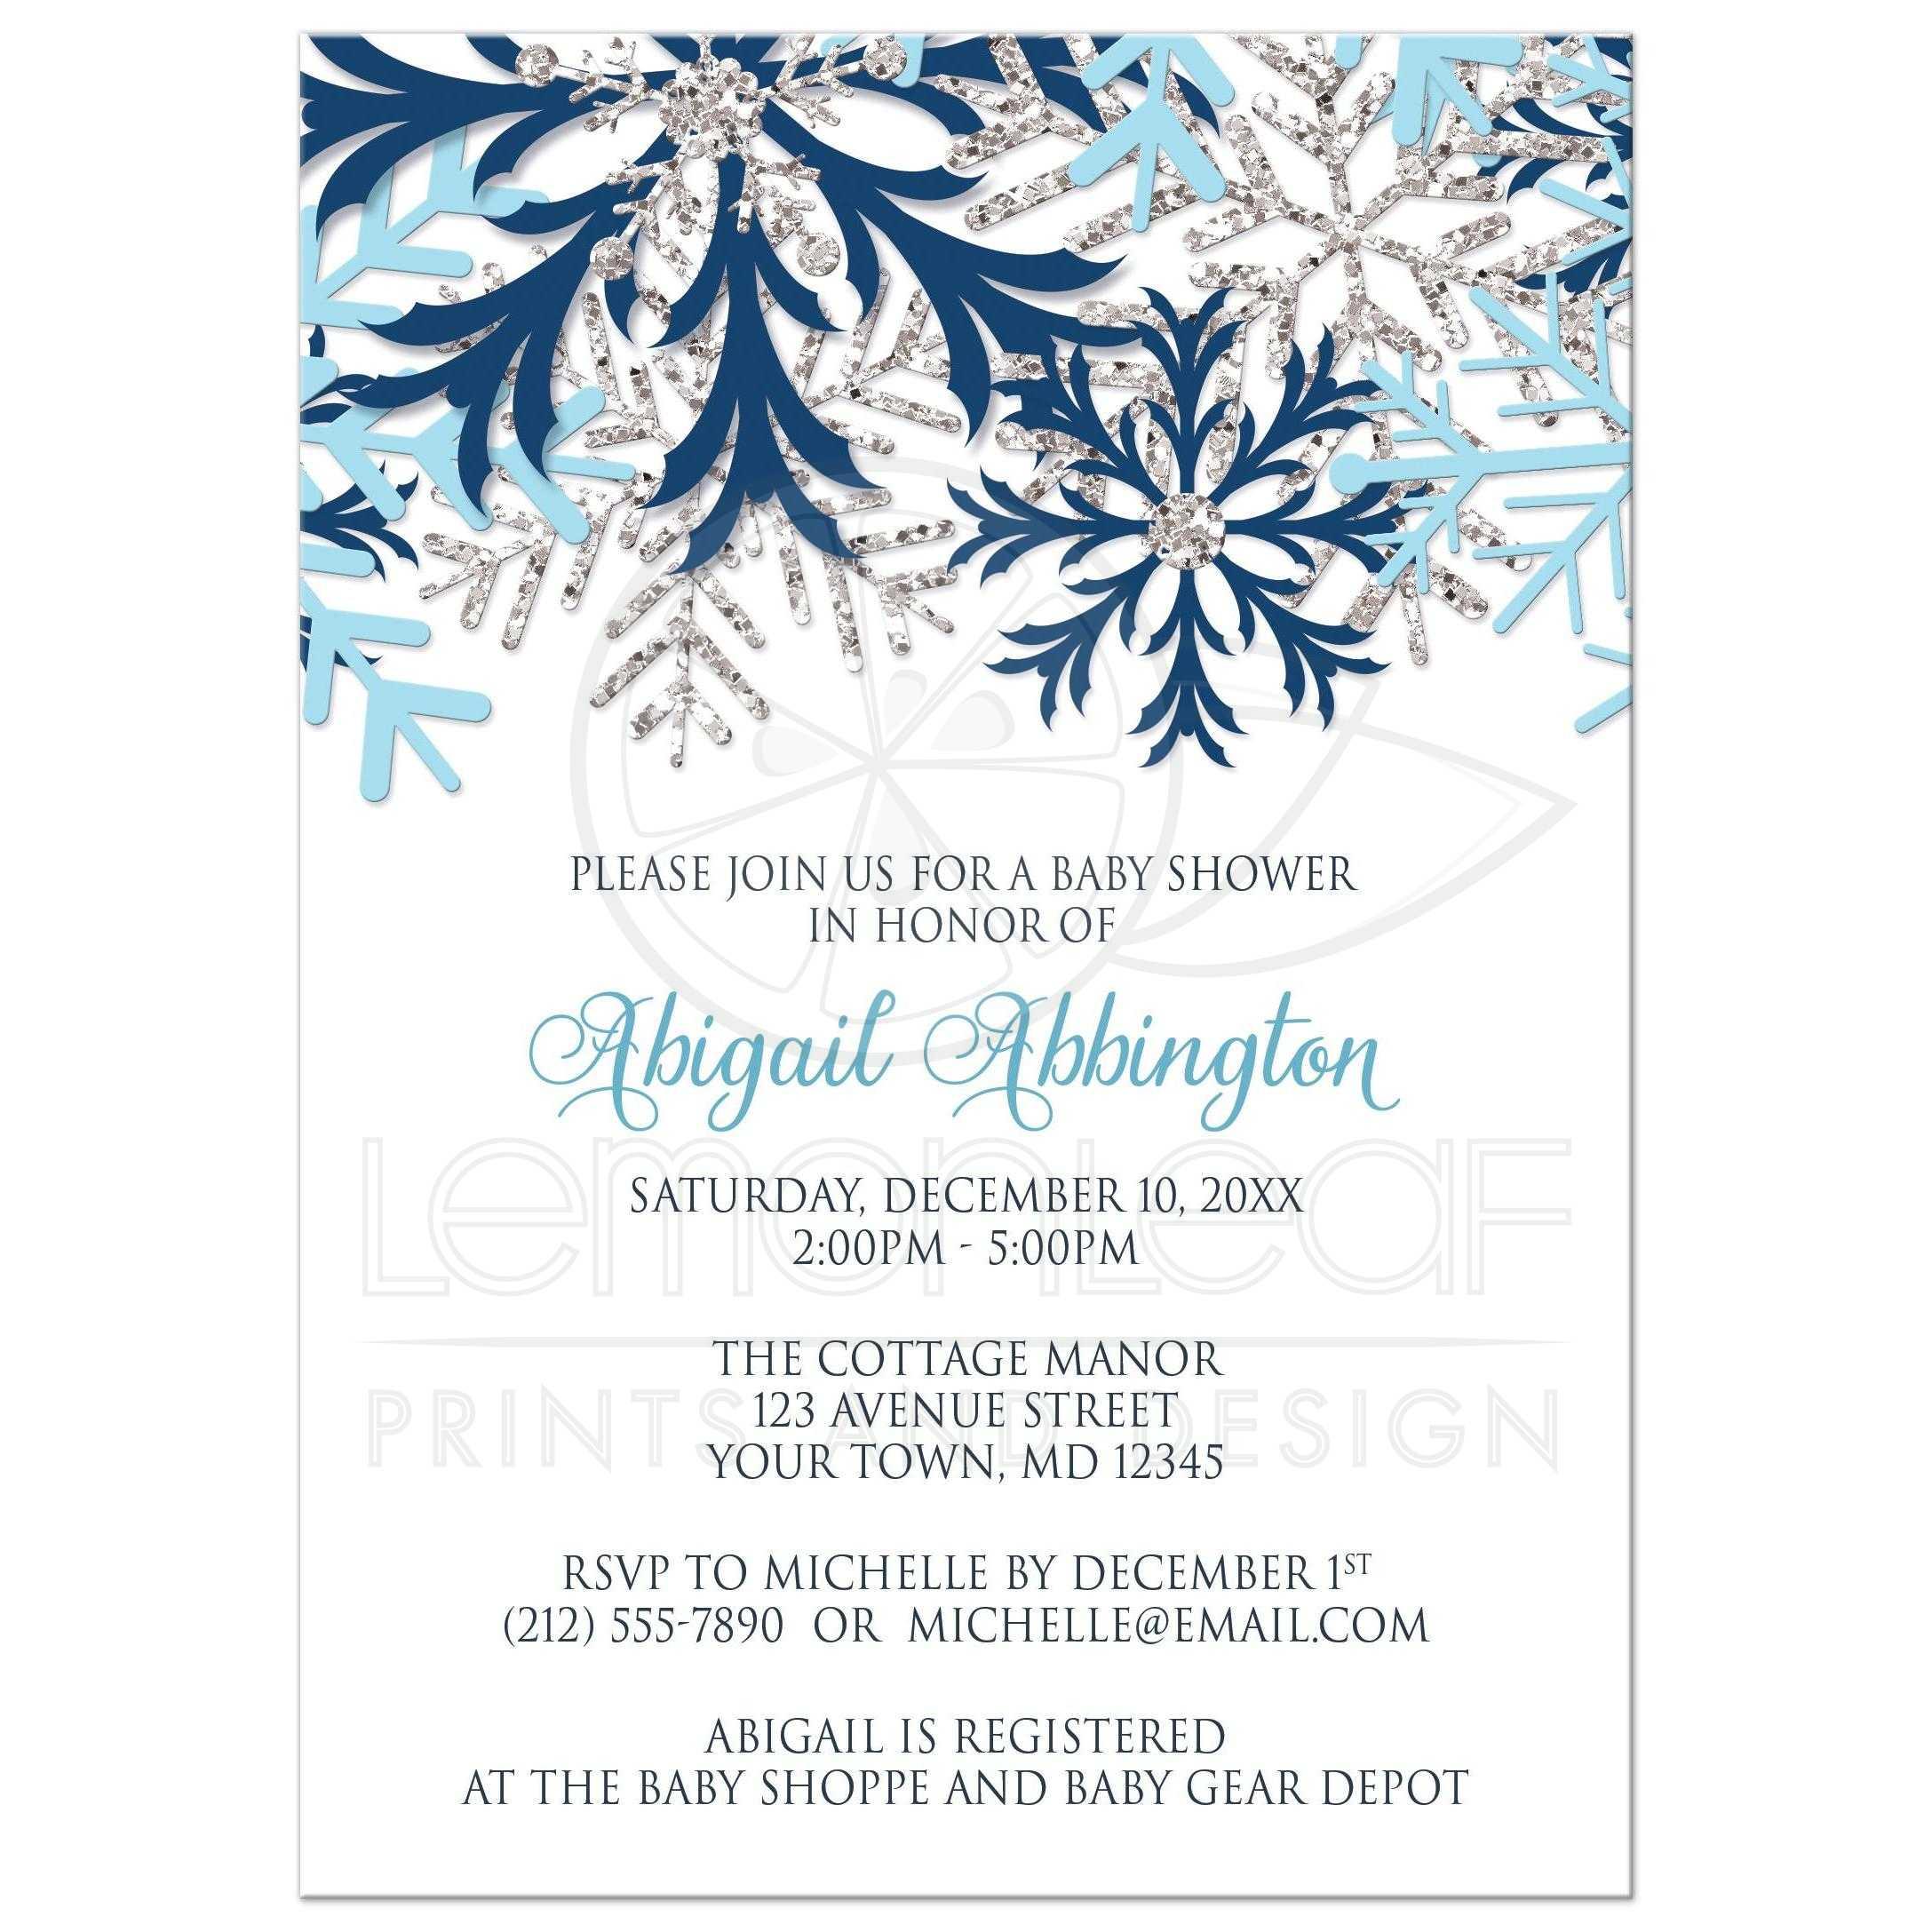 2719196ea4c 47715 Rectangle Snowflake Winter Blue Silver Baby Shower Invitations.jpg t 1481996047